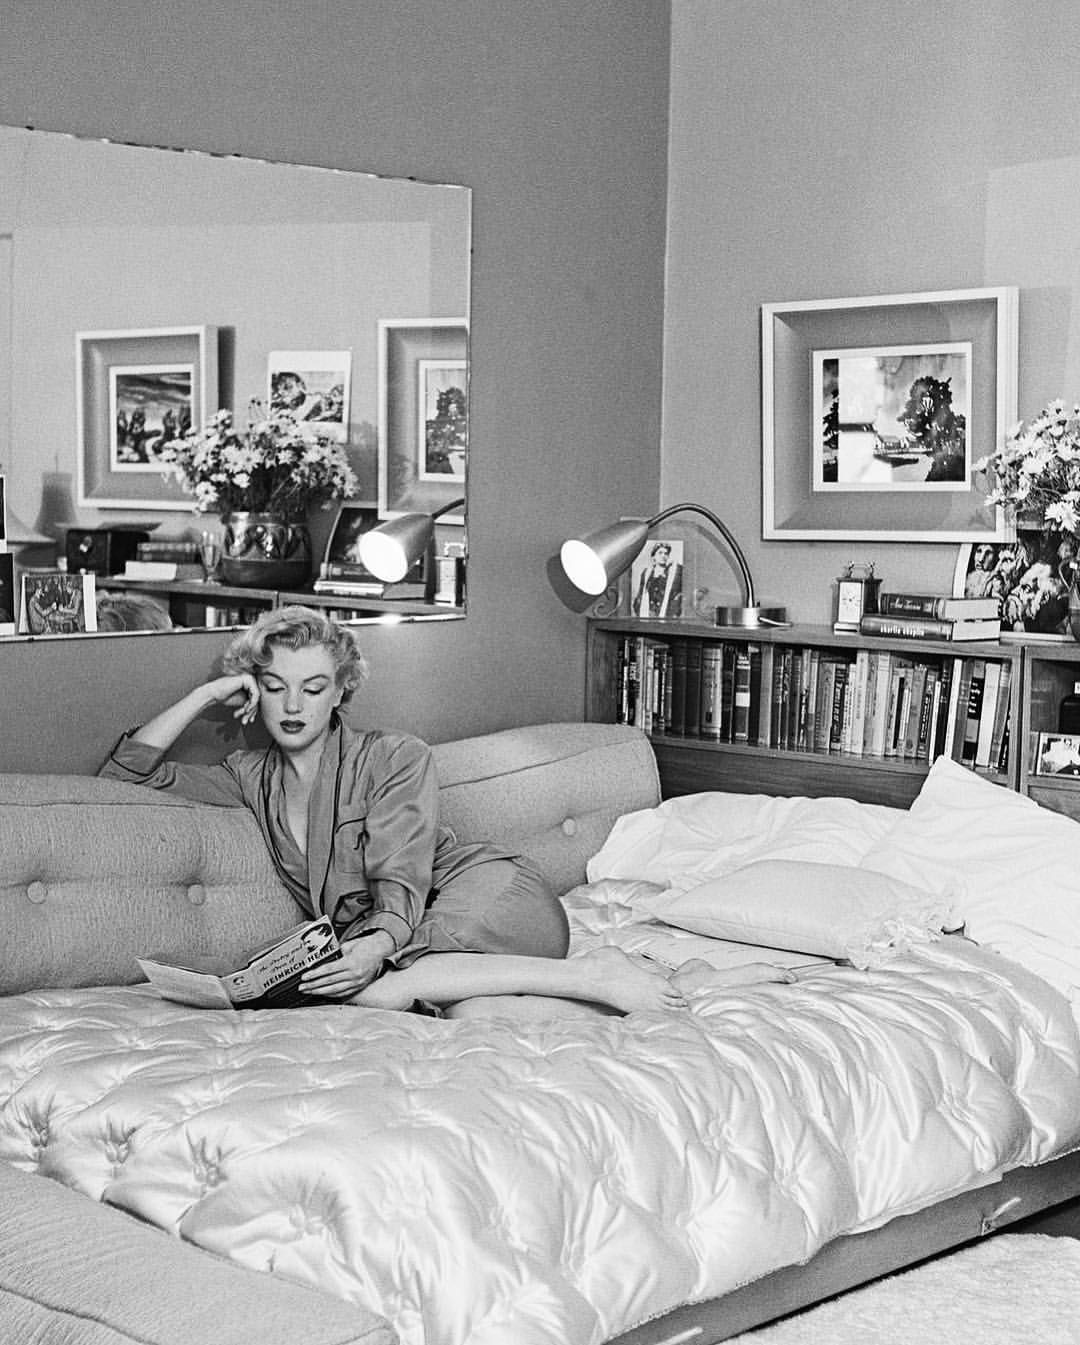 Marilyn Monroe Photographed In Her Bedroom 1951 Marilyn Monroe Room Marilyn Marilyn Monroe